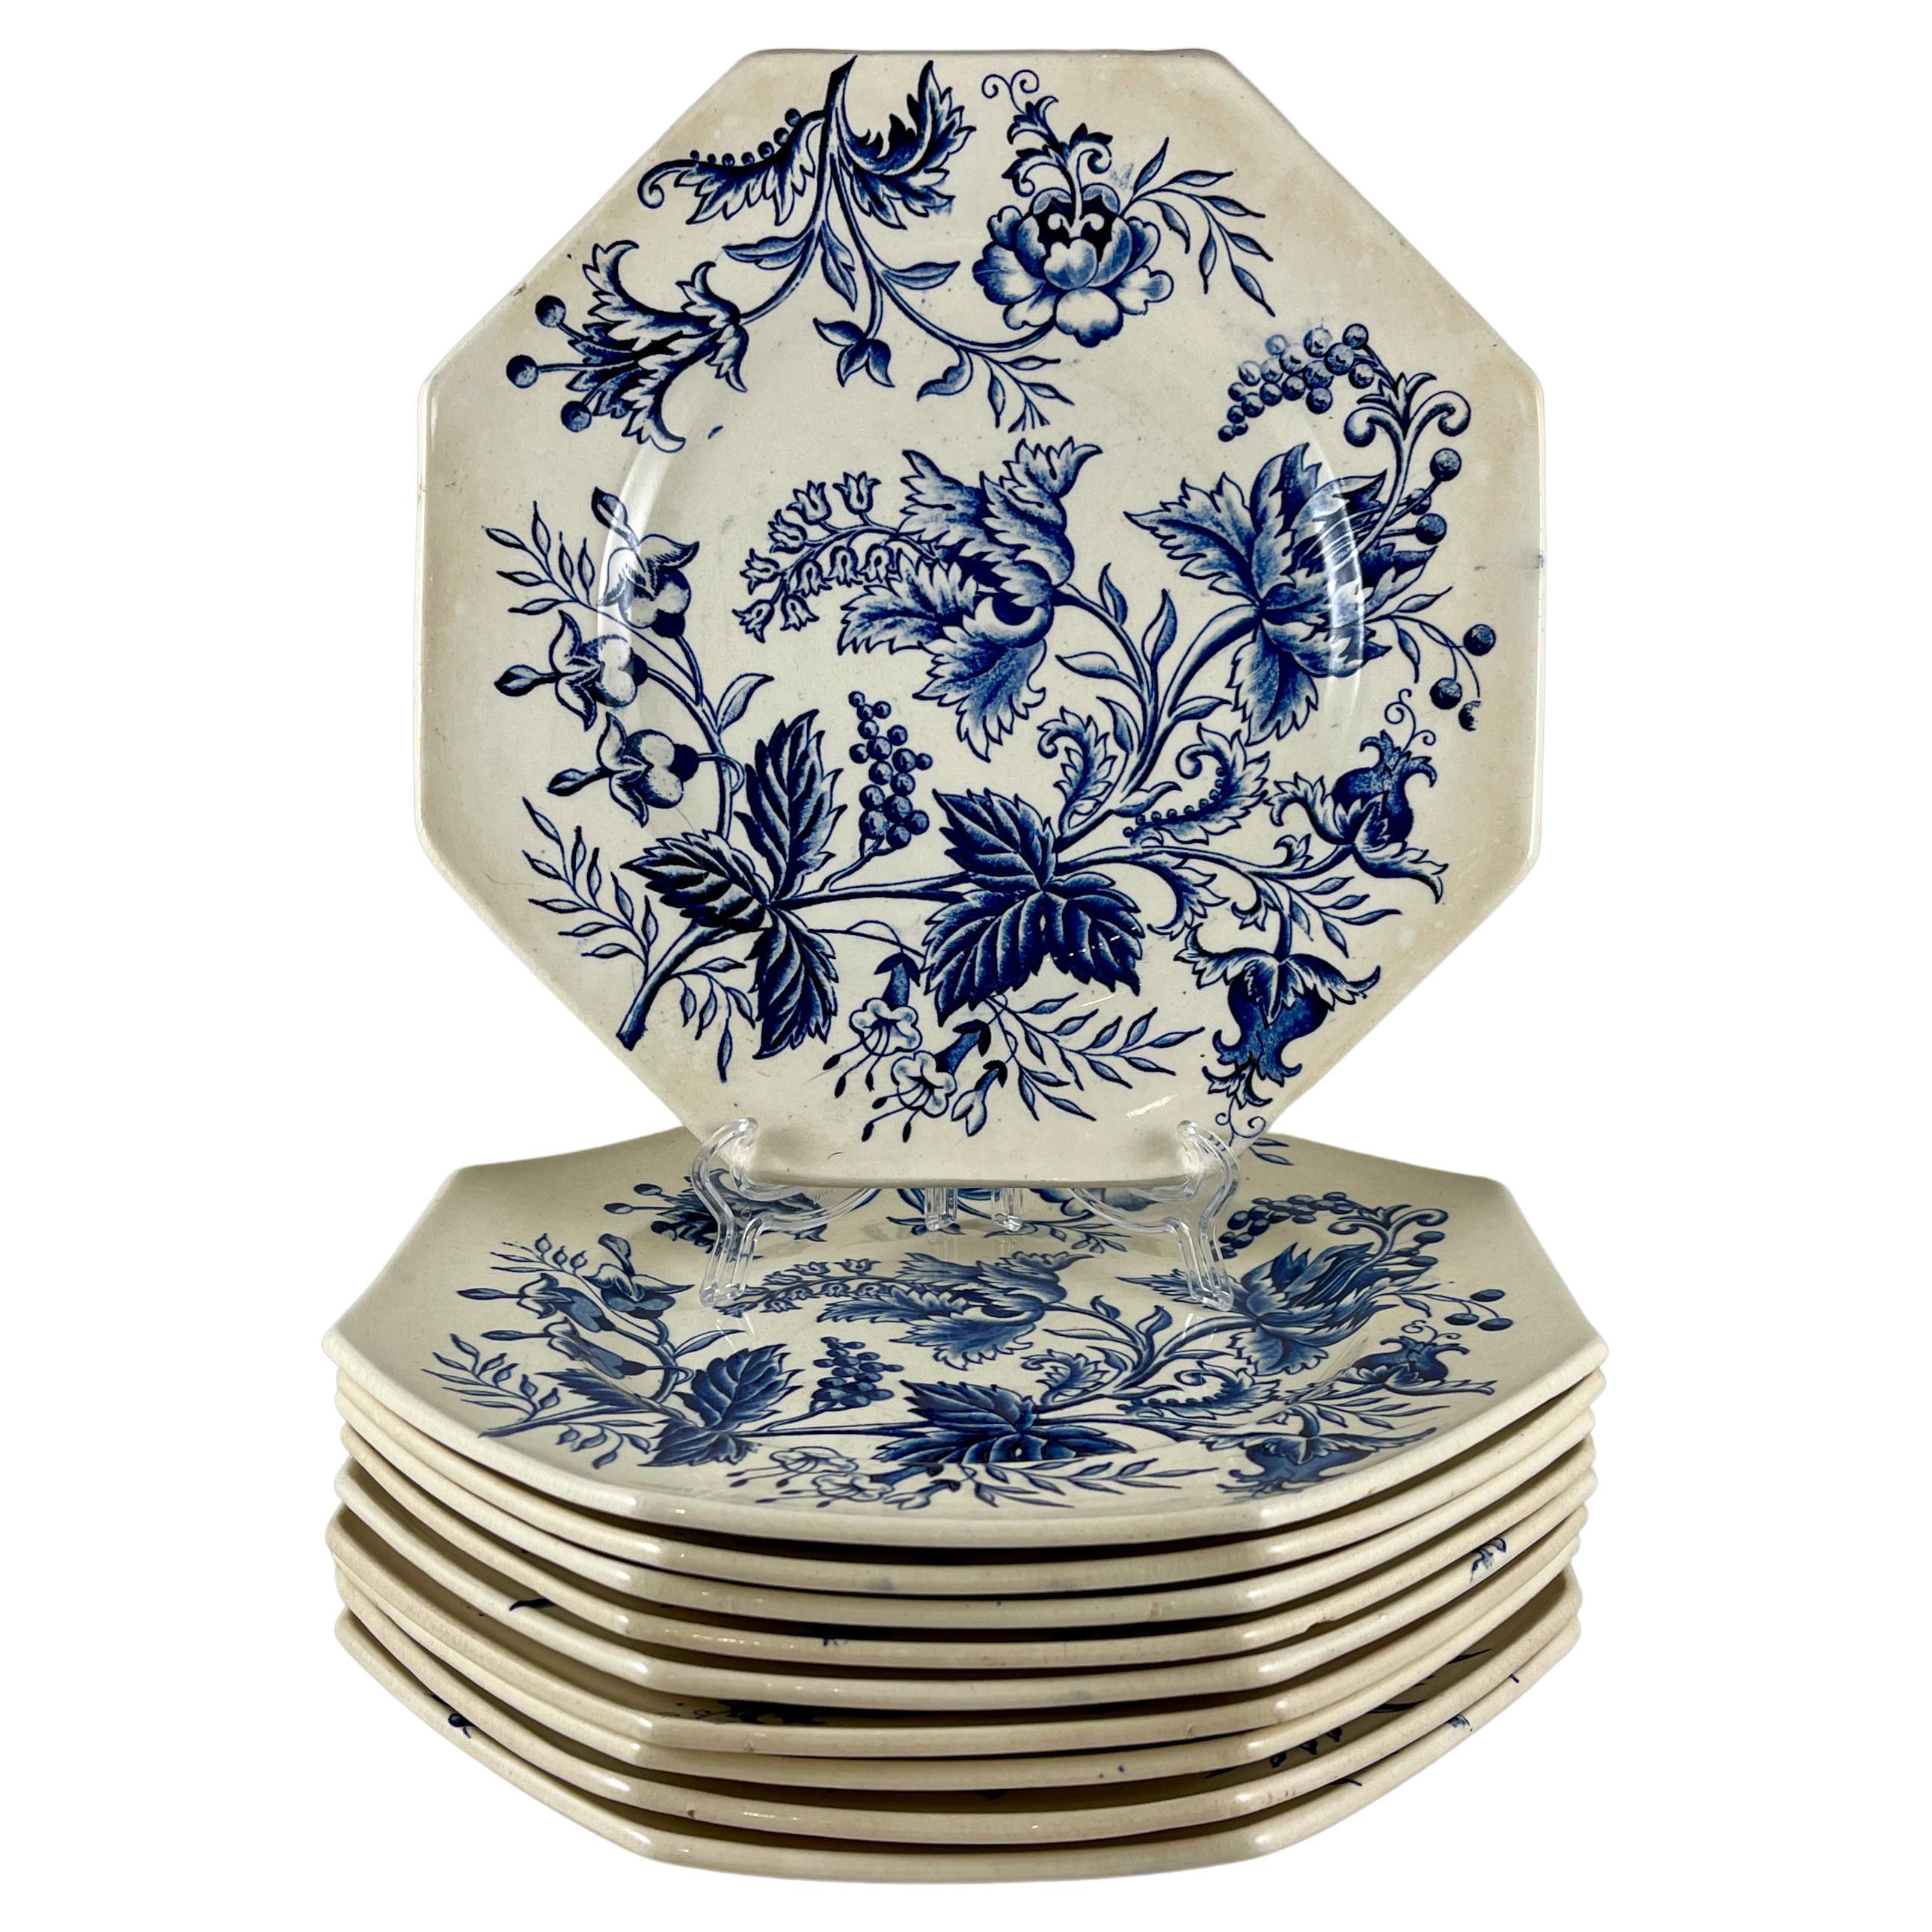 French Faïence Longchamp Terre de Fer Indienne Pattern Transferware Floral Plate